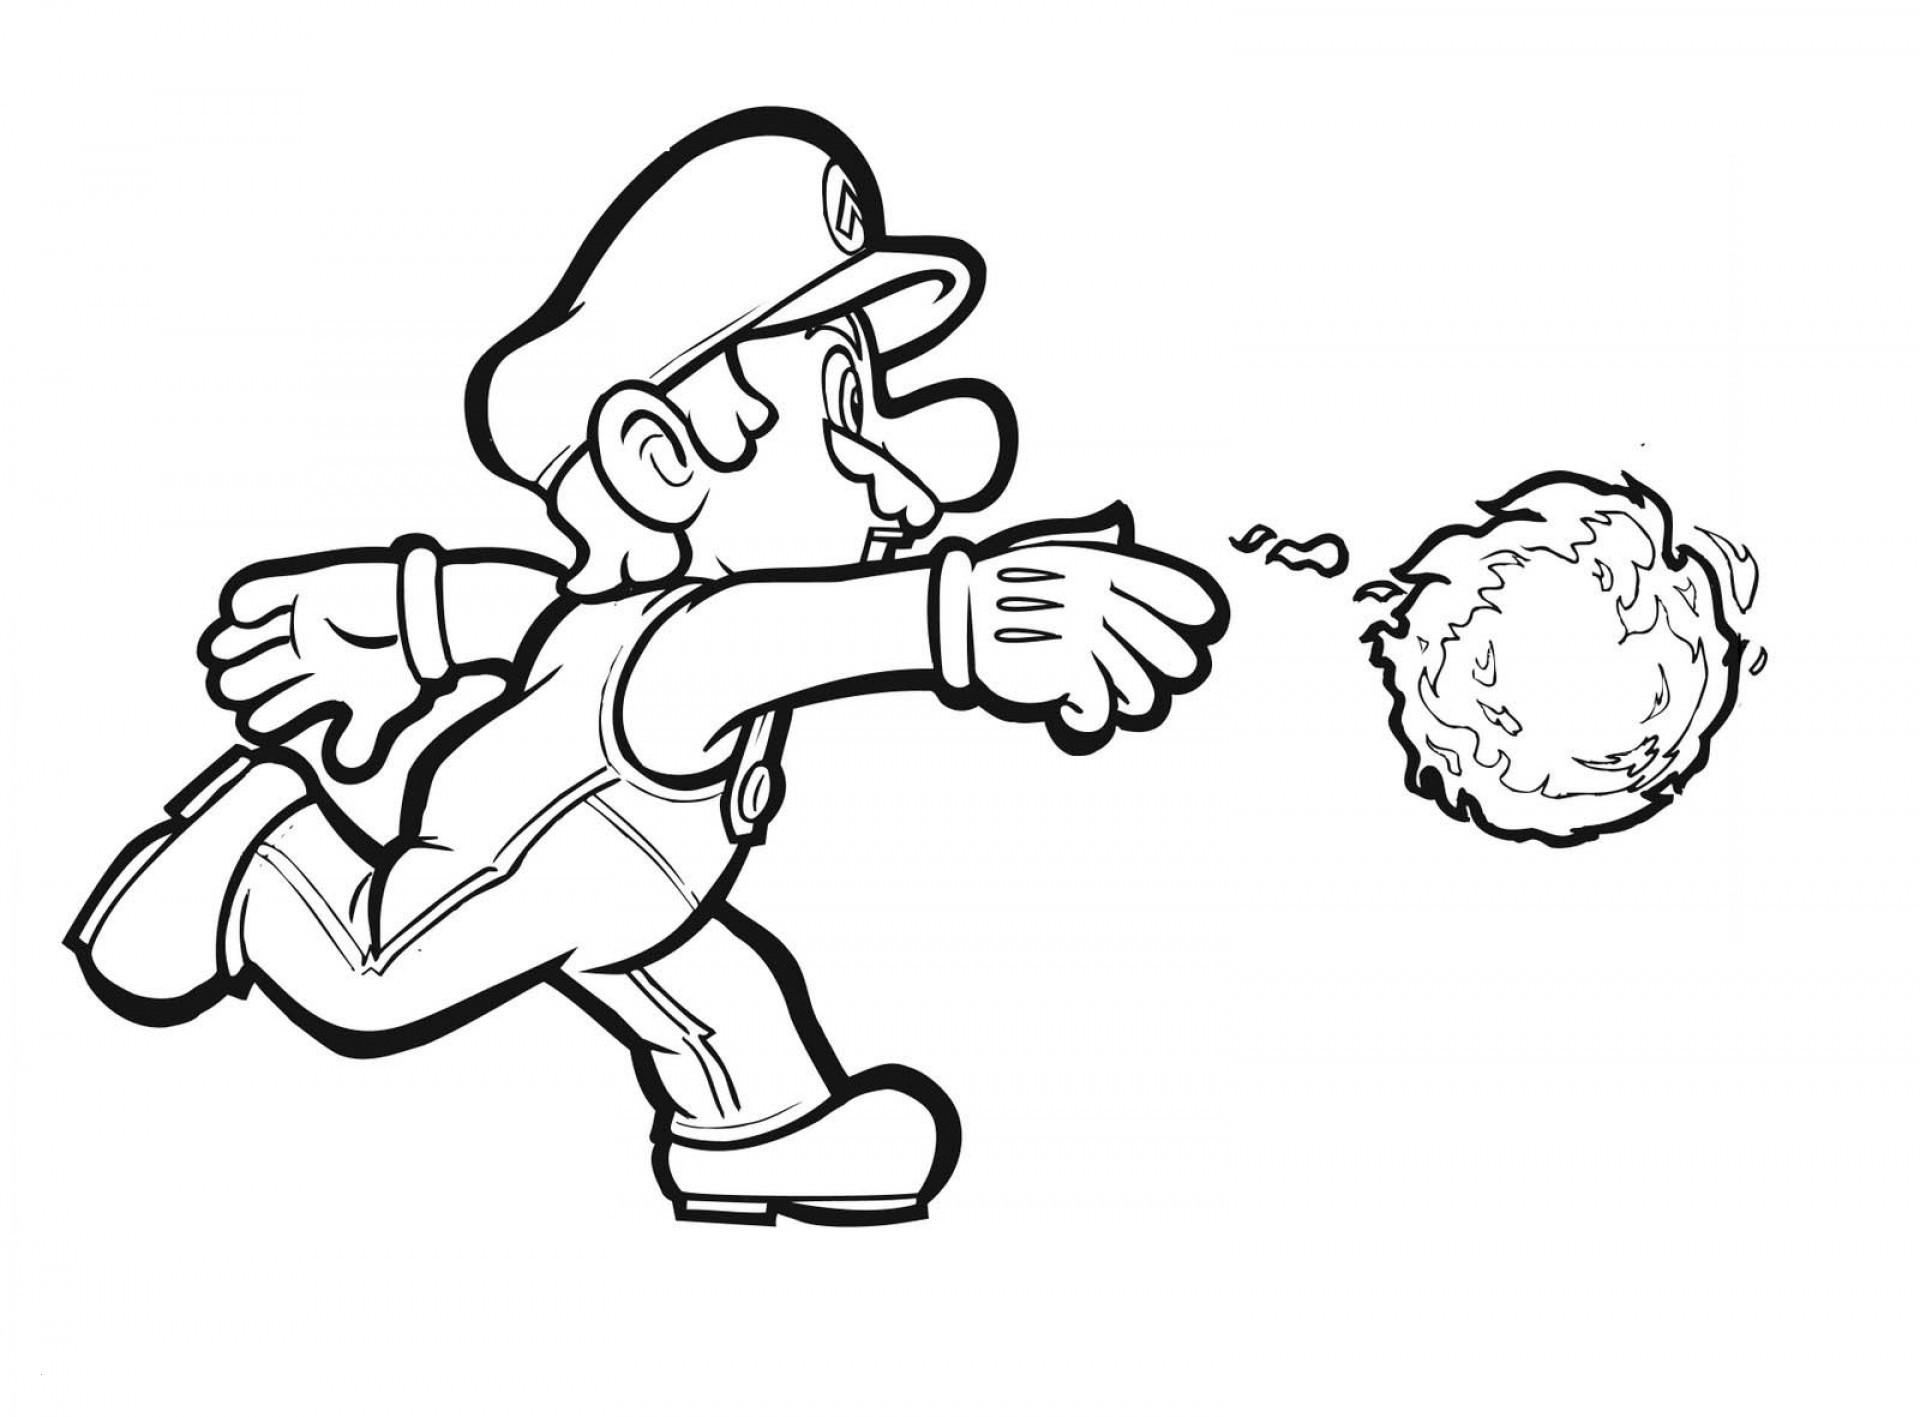 Mario Kart Ausmalbilder Genial Ausmalbilder Mario Kart 8 Uploadertalk Neu Ausmalbilder Mario Kart 8 Galerie